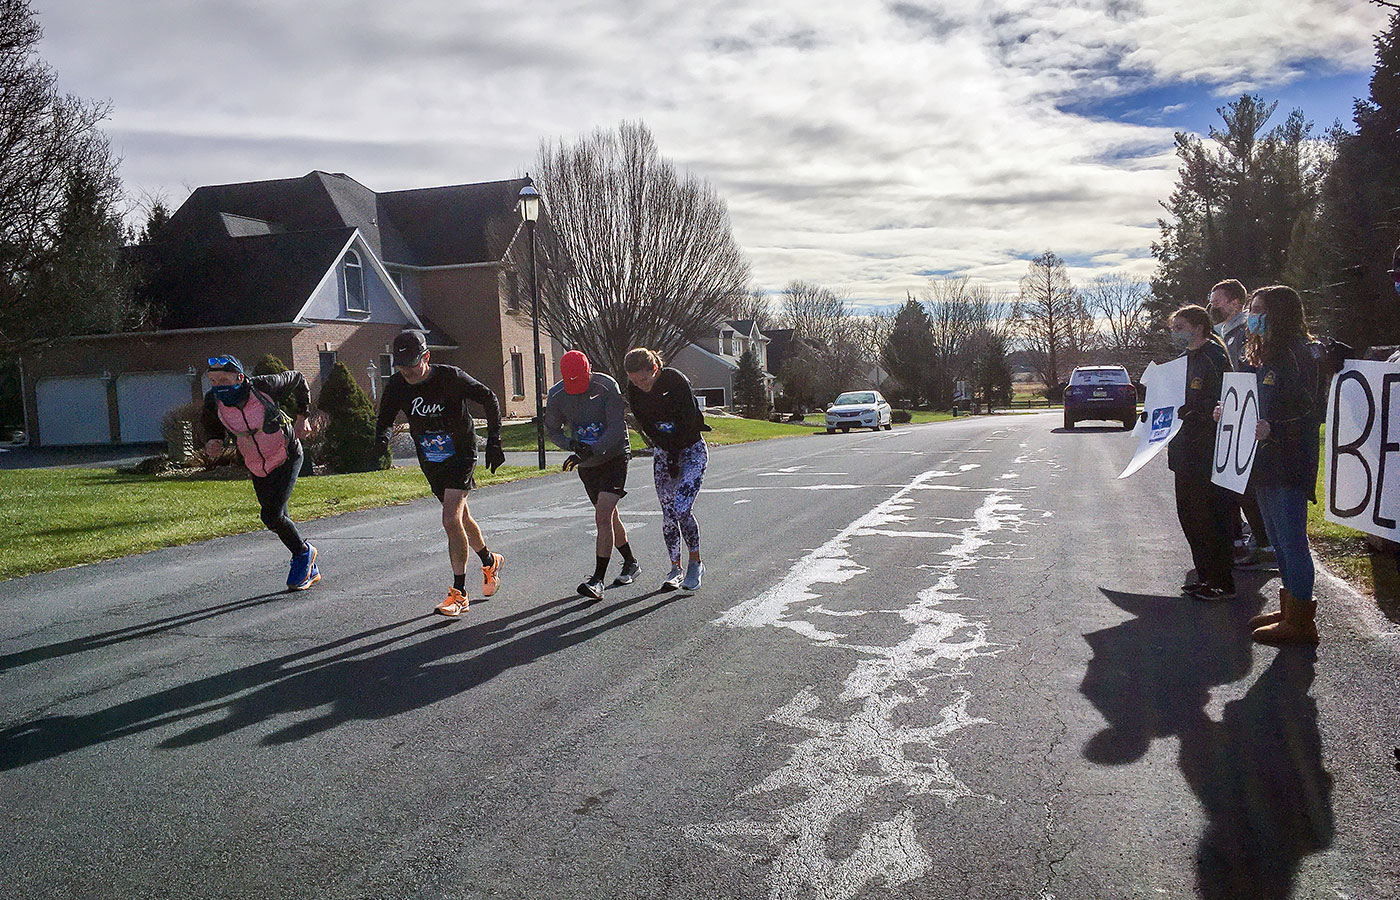 the Decker family running a Neighborhood Half marathon